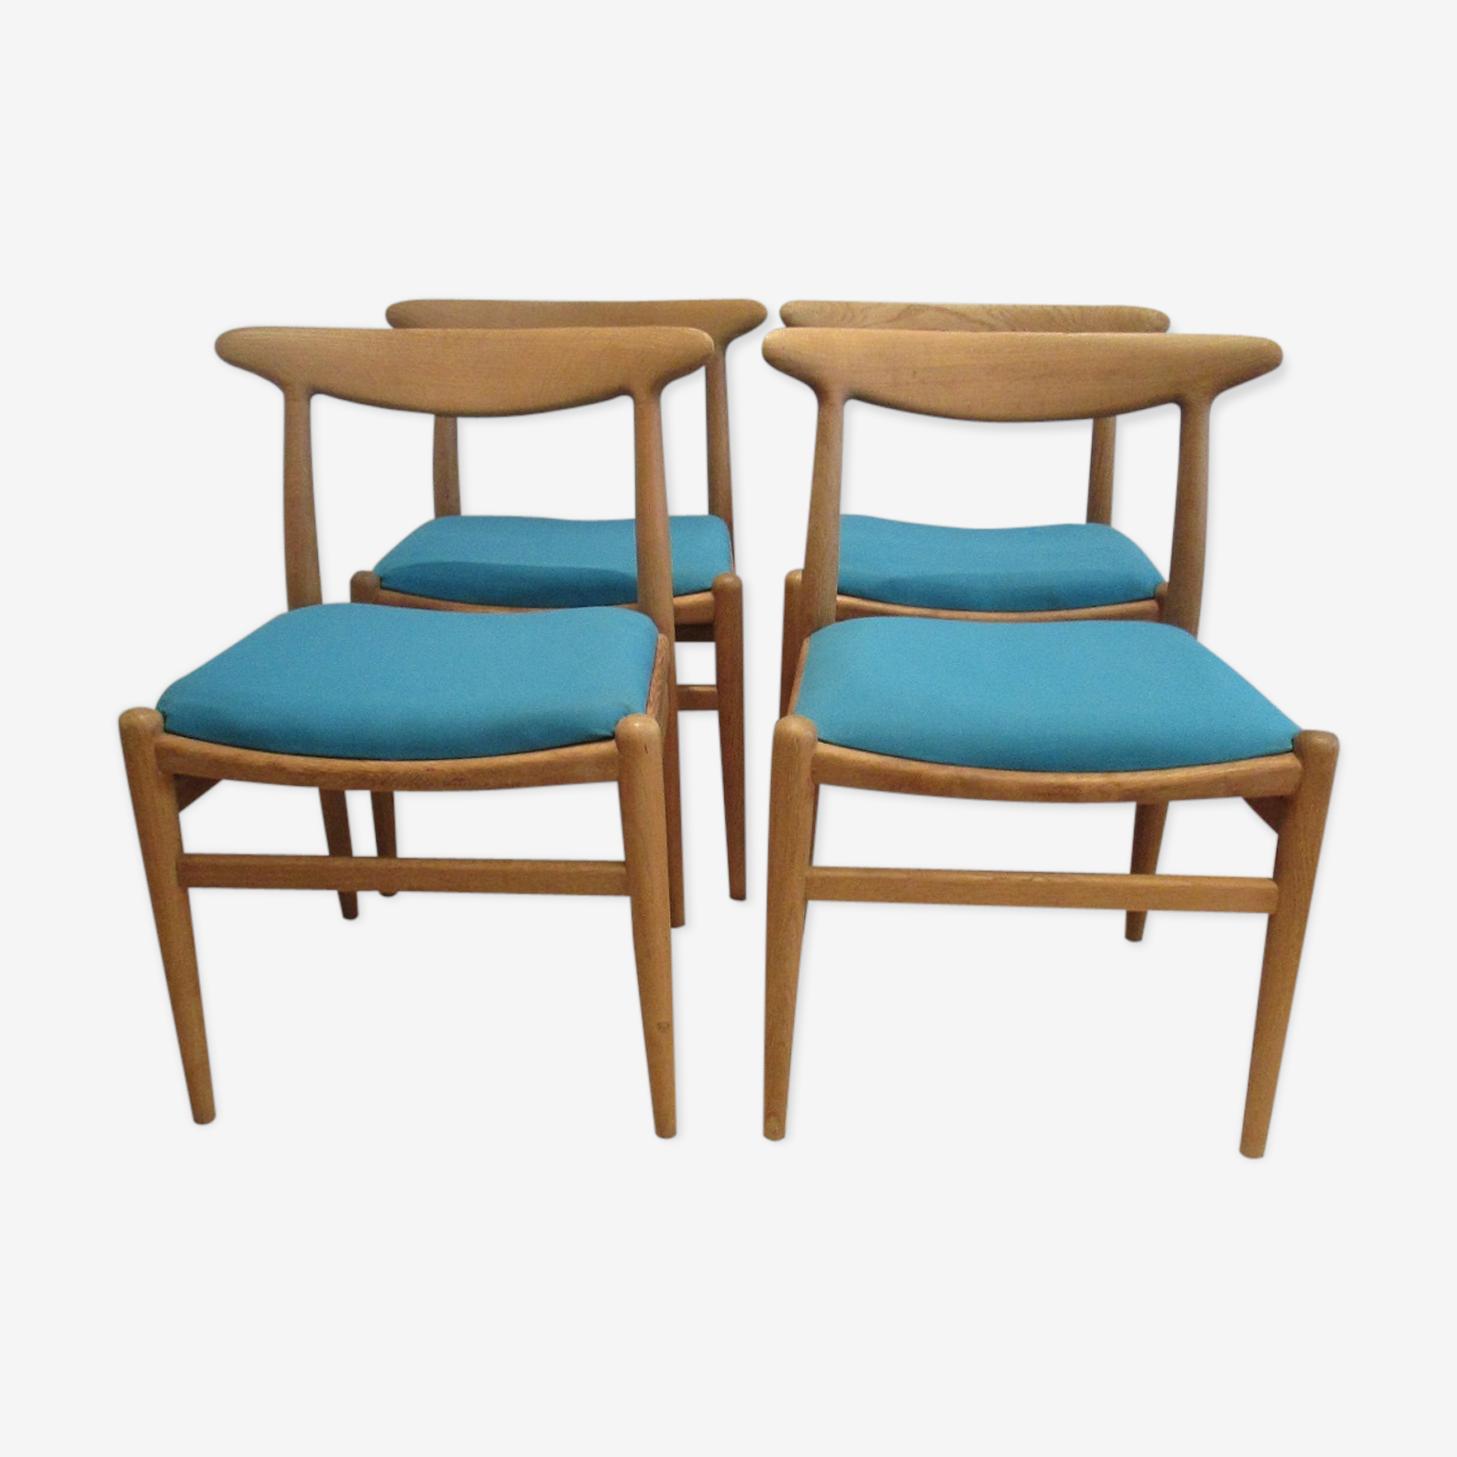 4 chairs W2 by Hans Wegner